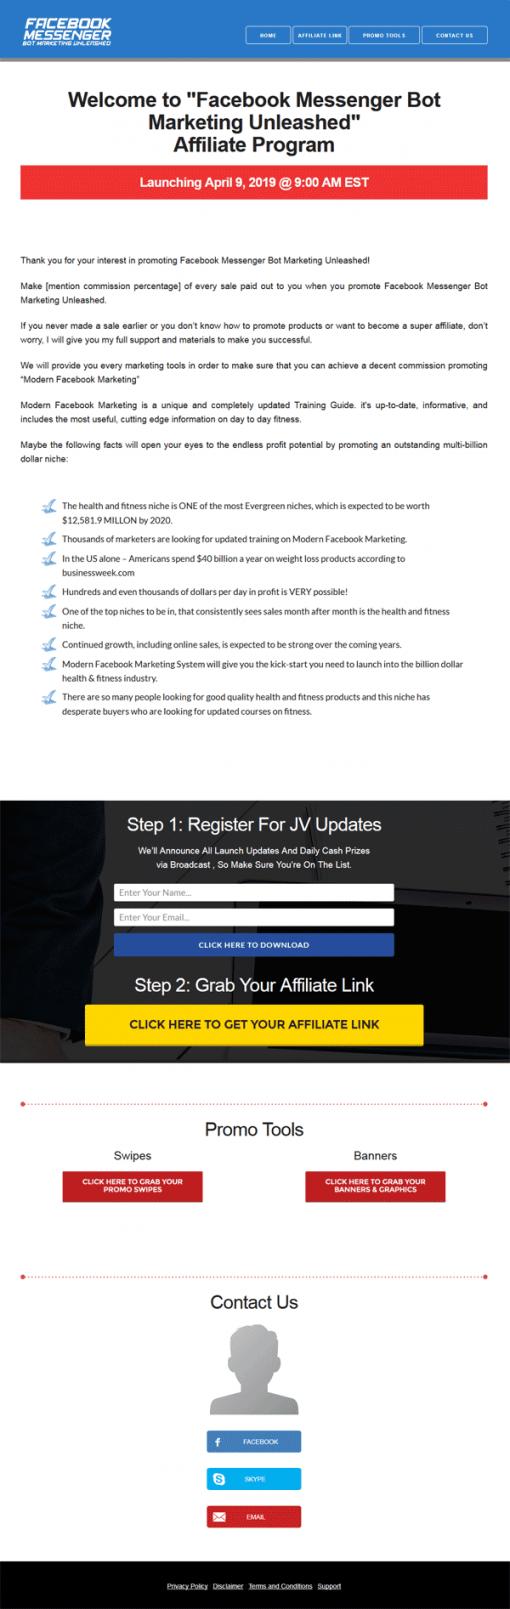 Facebook Messenger Bot Marketing Ebook and Videos MRR